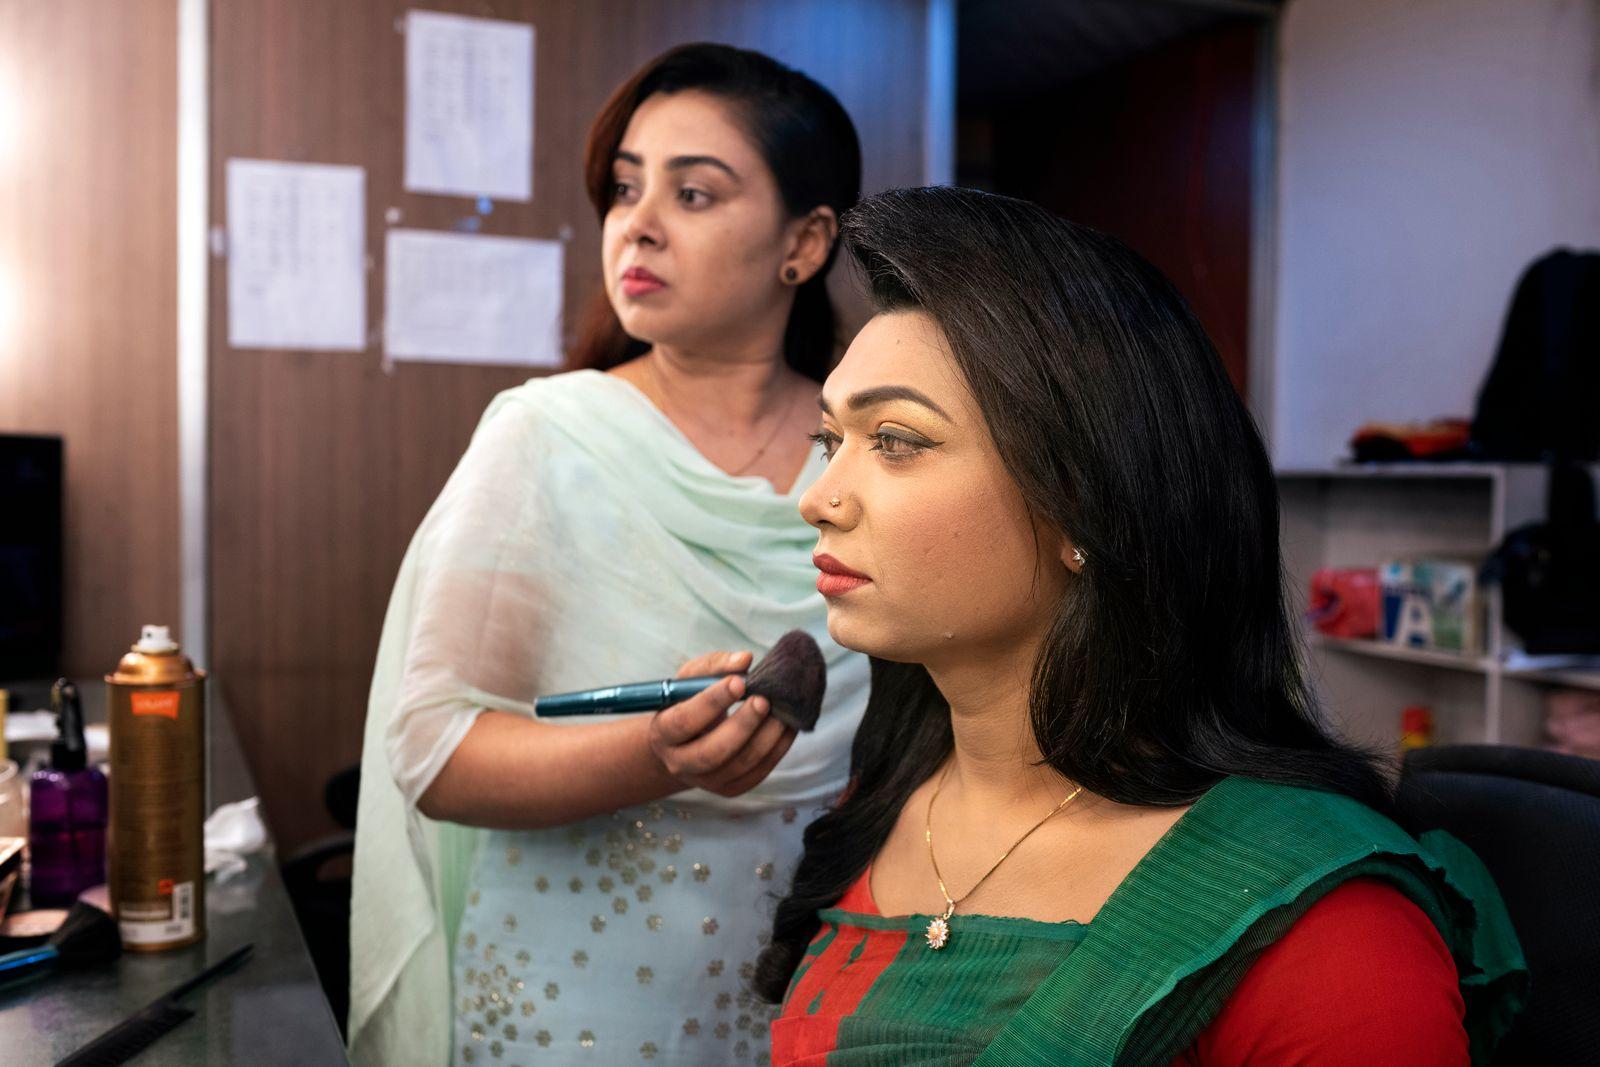 Tashnuva Anan Shishir, seated, prepares to present the news at the Boishakhi TV studio in Dhaka, Bangladesh, on Saturday, March 13, 2021. (Fabeha Monir/The New York Times)